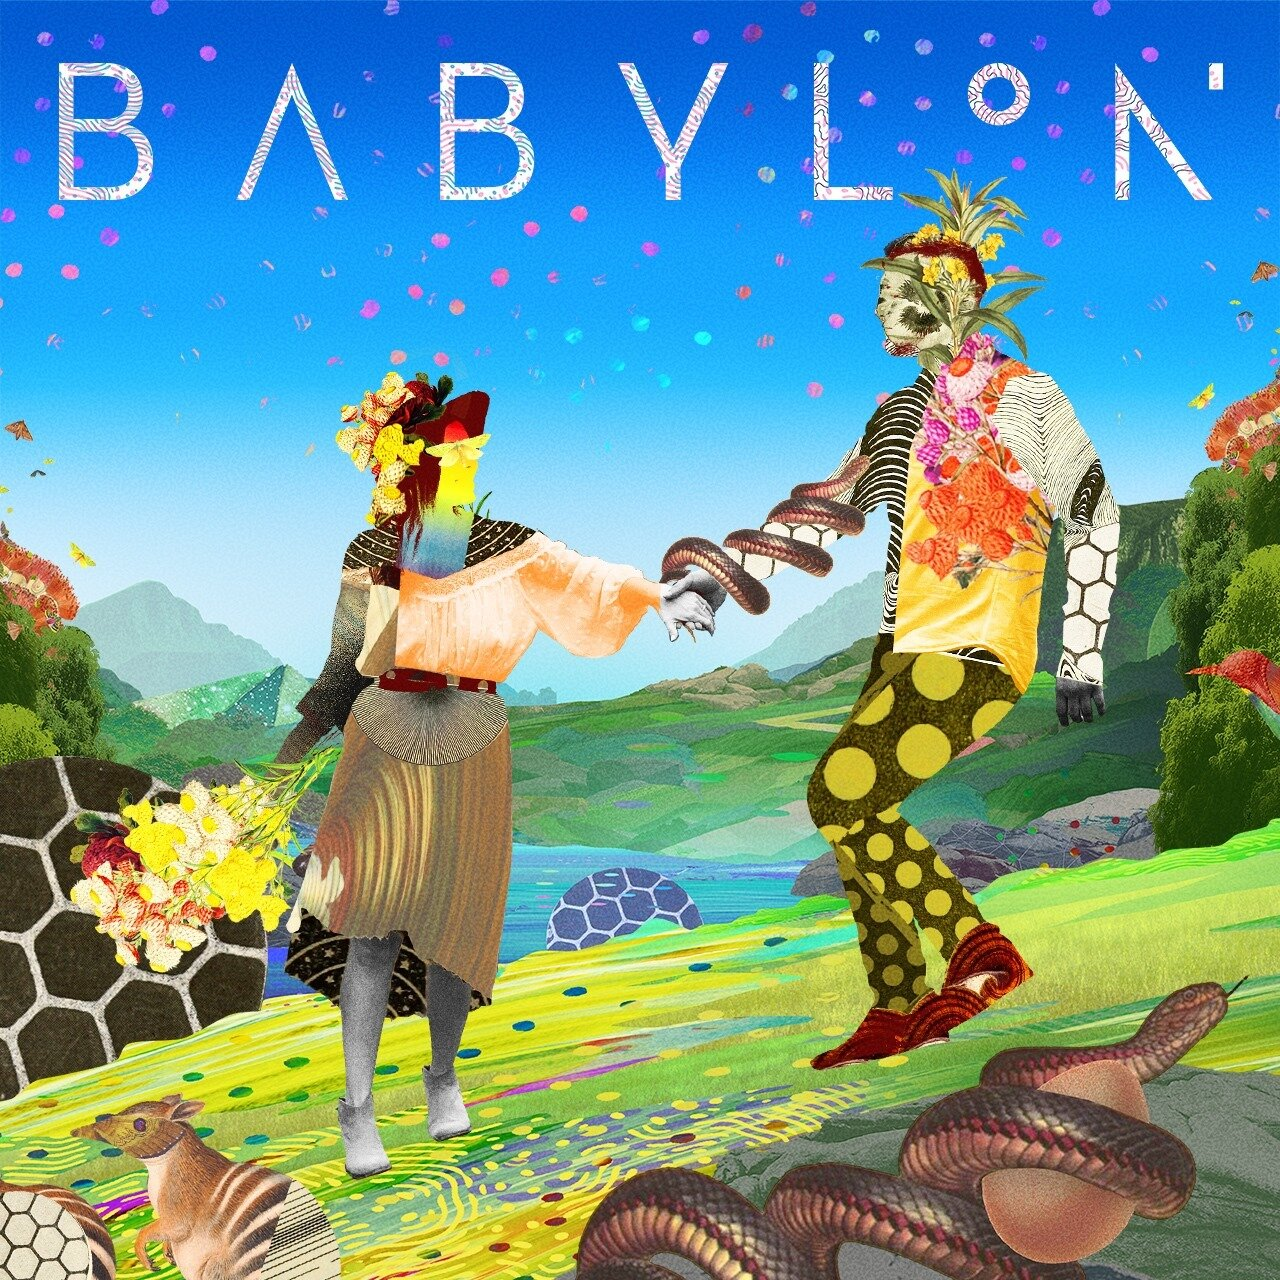 Babylon Festival '20 - Feb 21-23 @ Carapooee west, vic